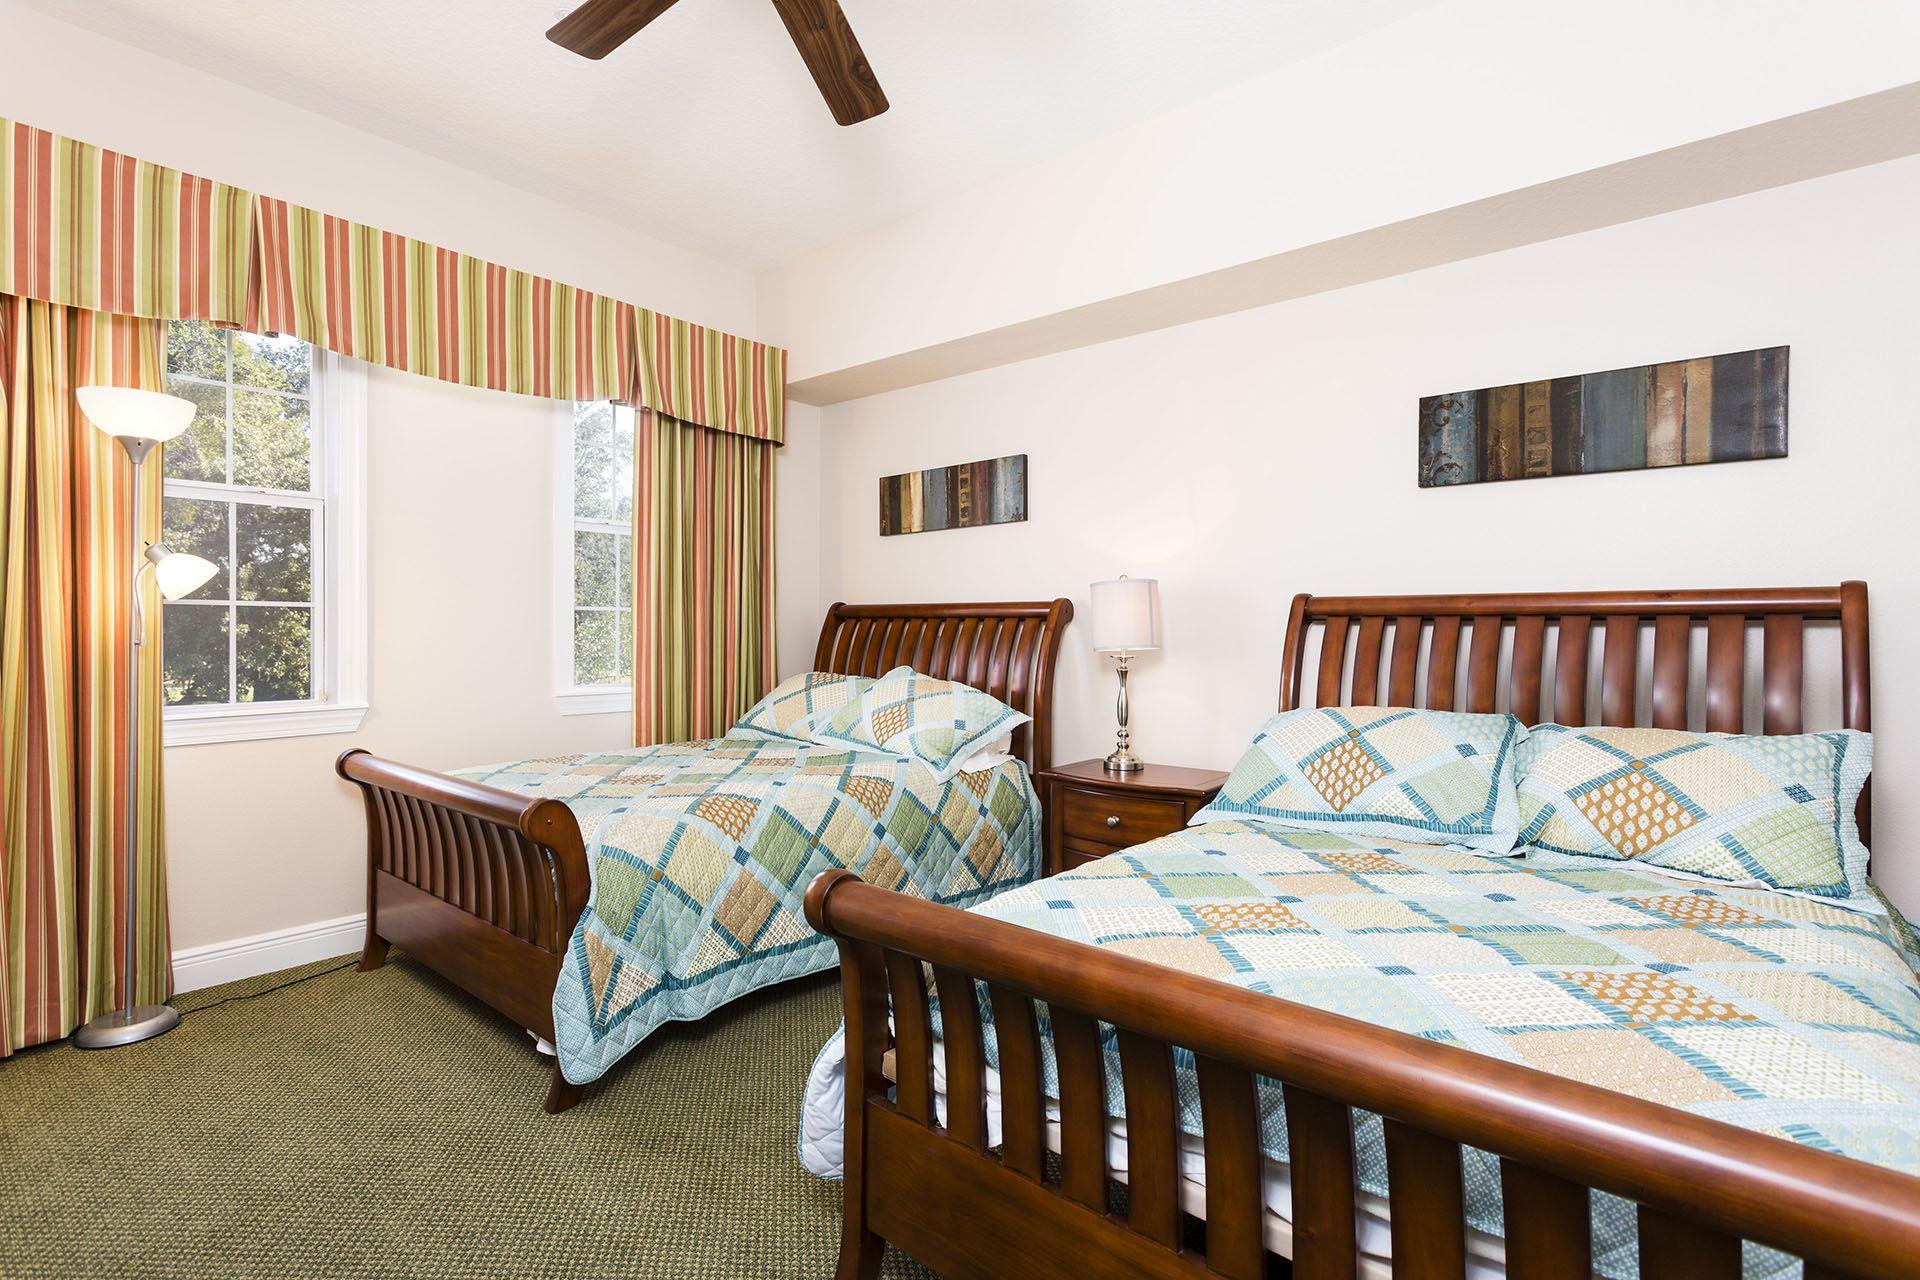 Reunion 3 Bedroom Condo R100 #Vacationrental #Reunion #Orlando #Florida #Universal